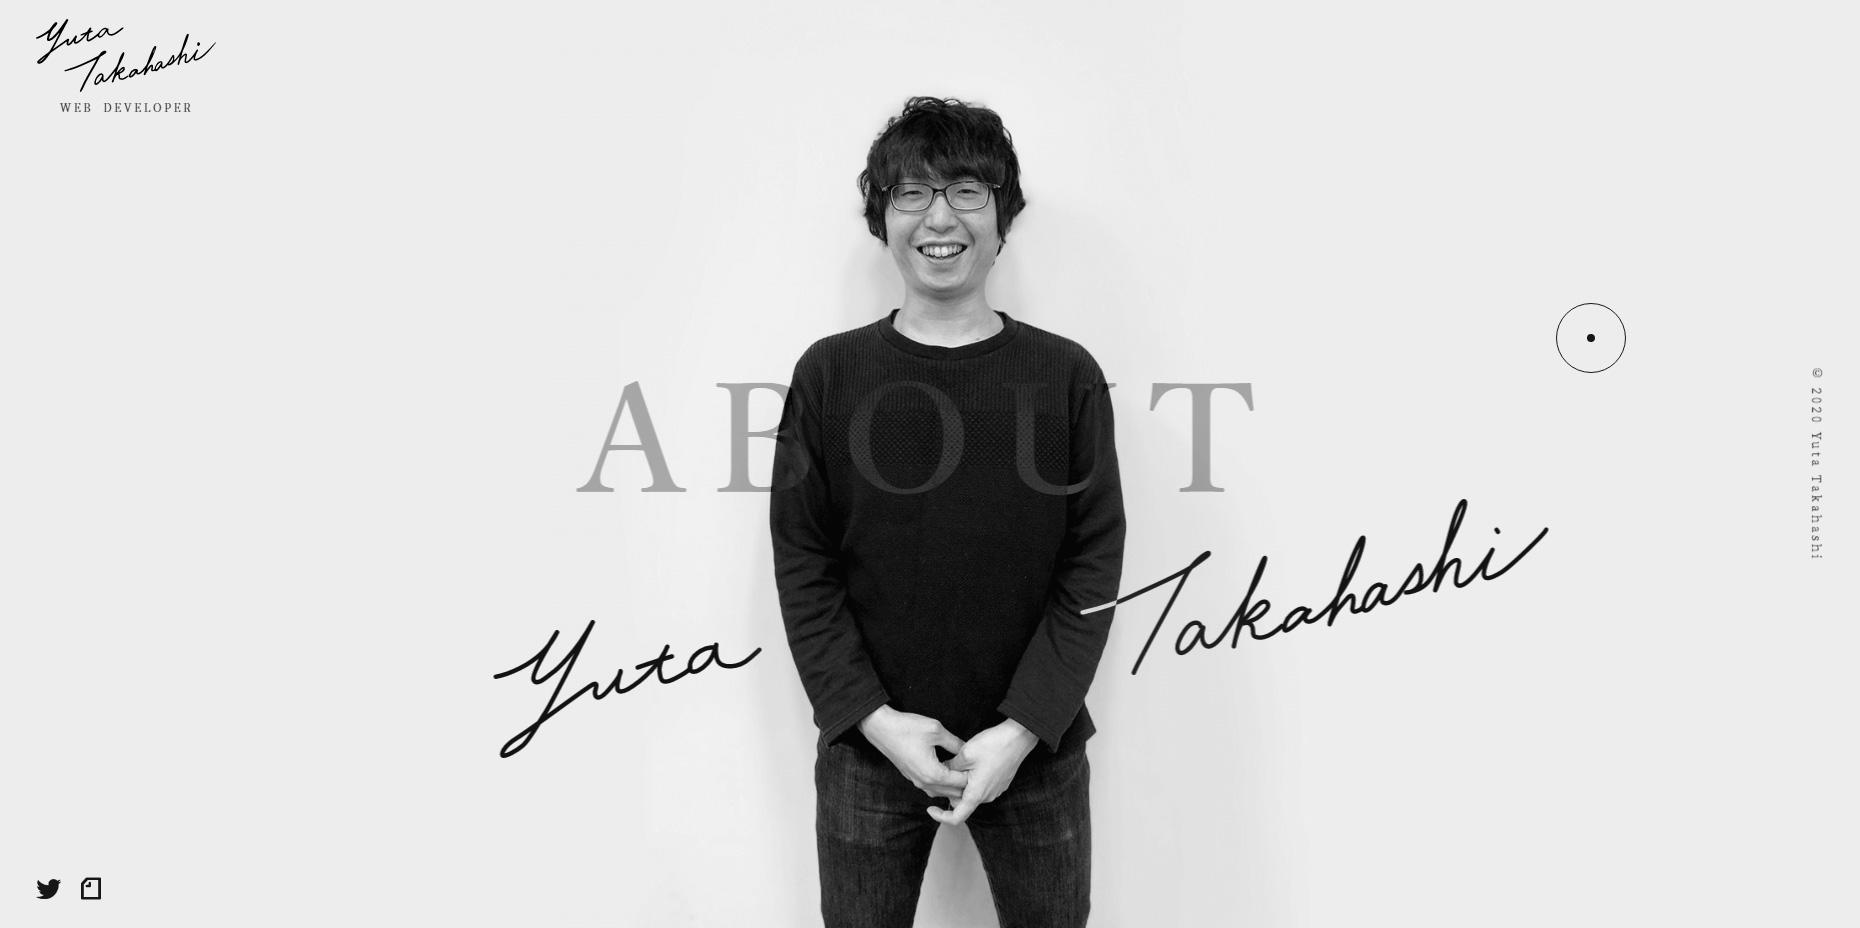 Yuta Takahashi - Portfolio - Website of the Day